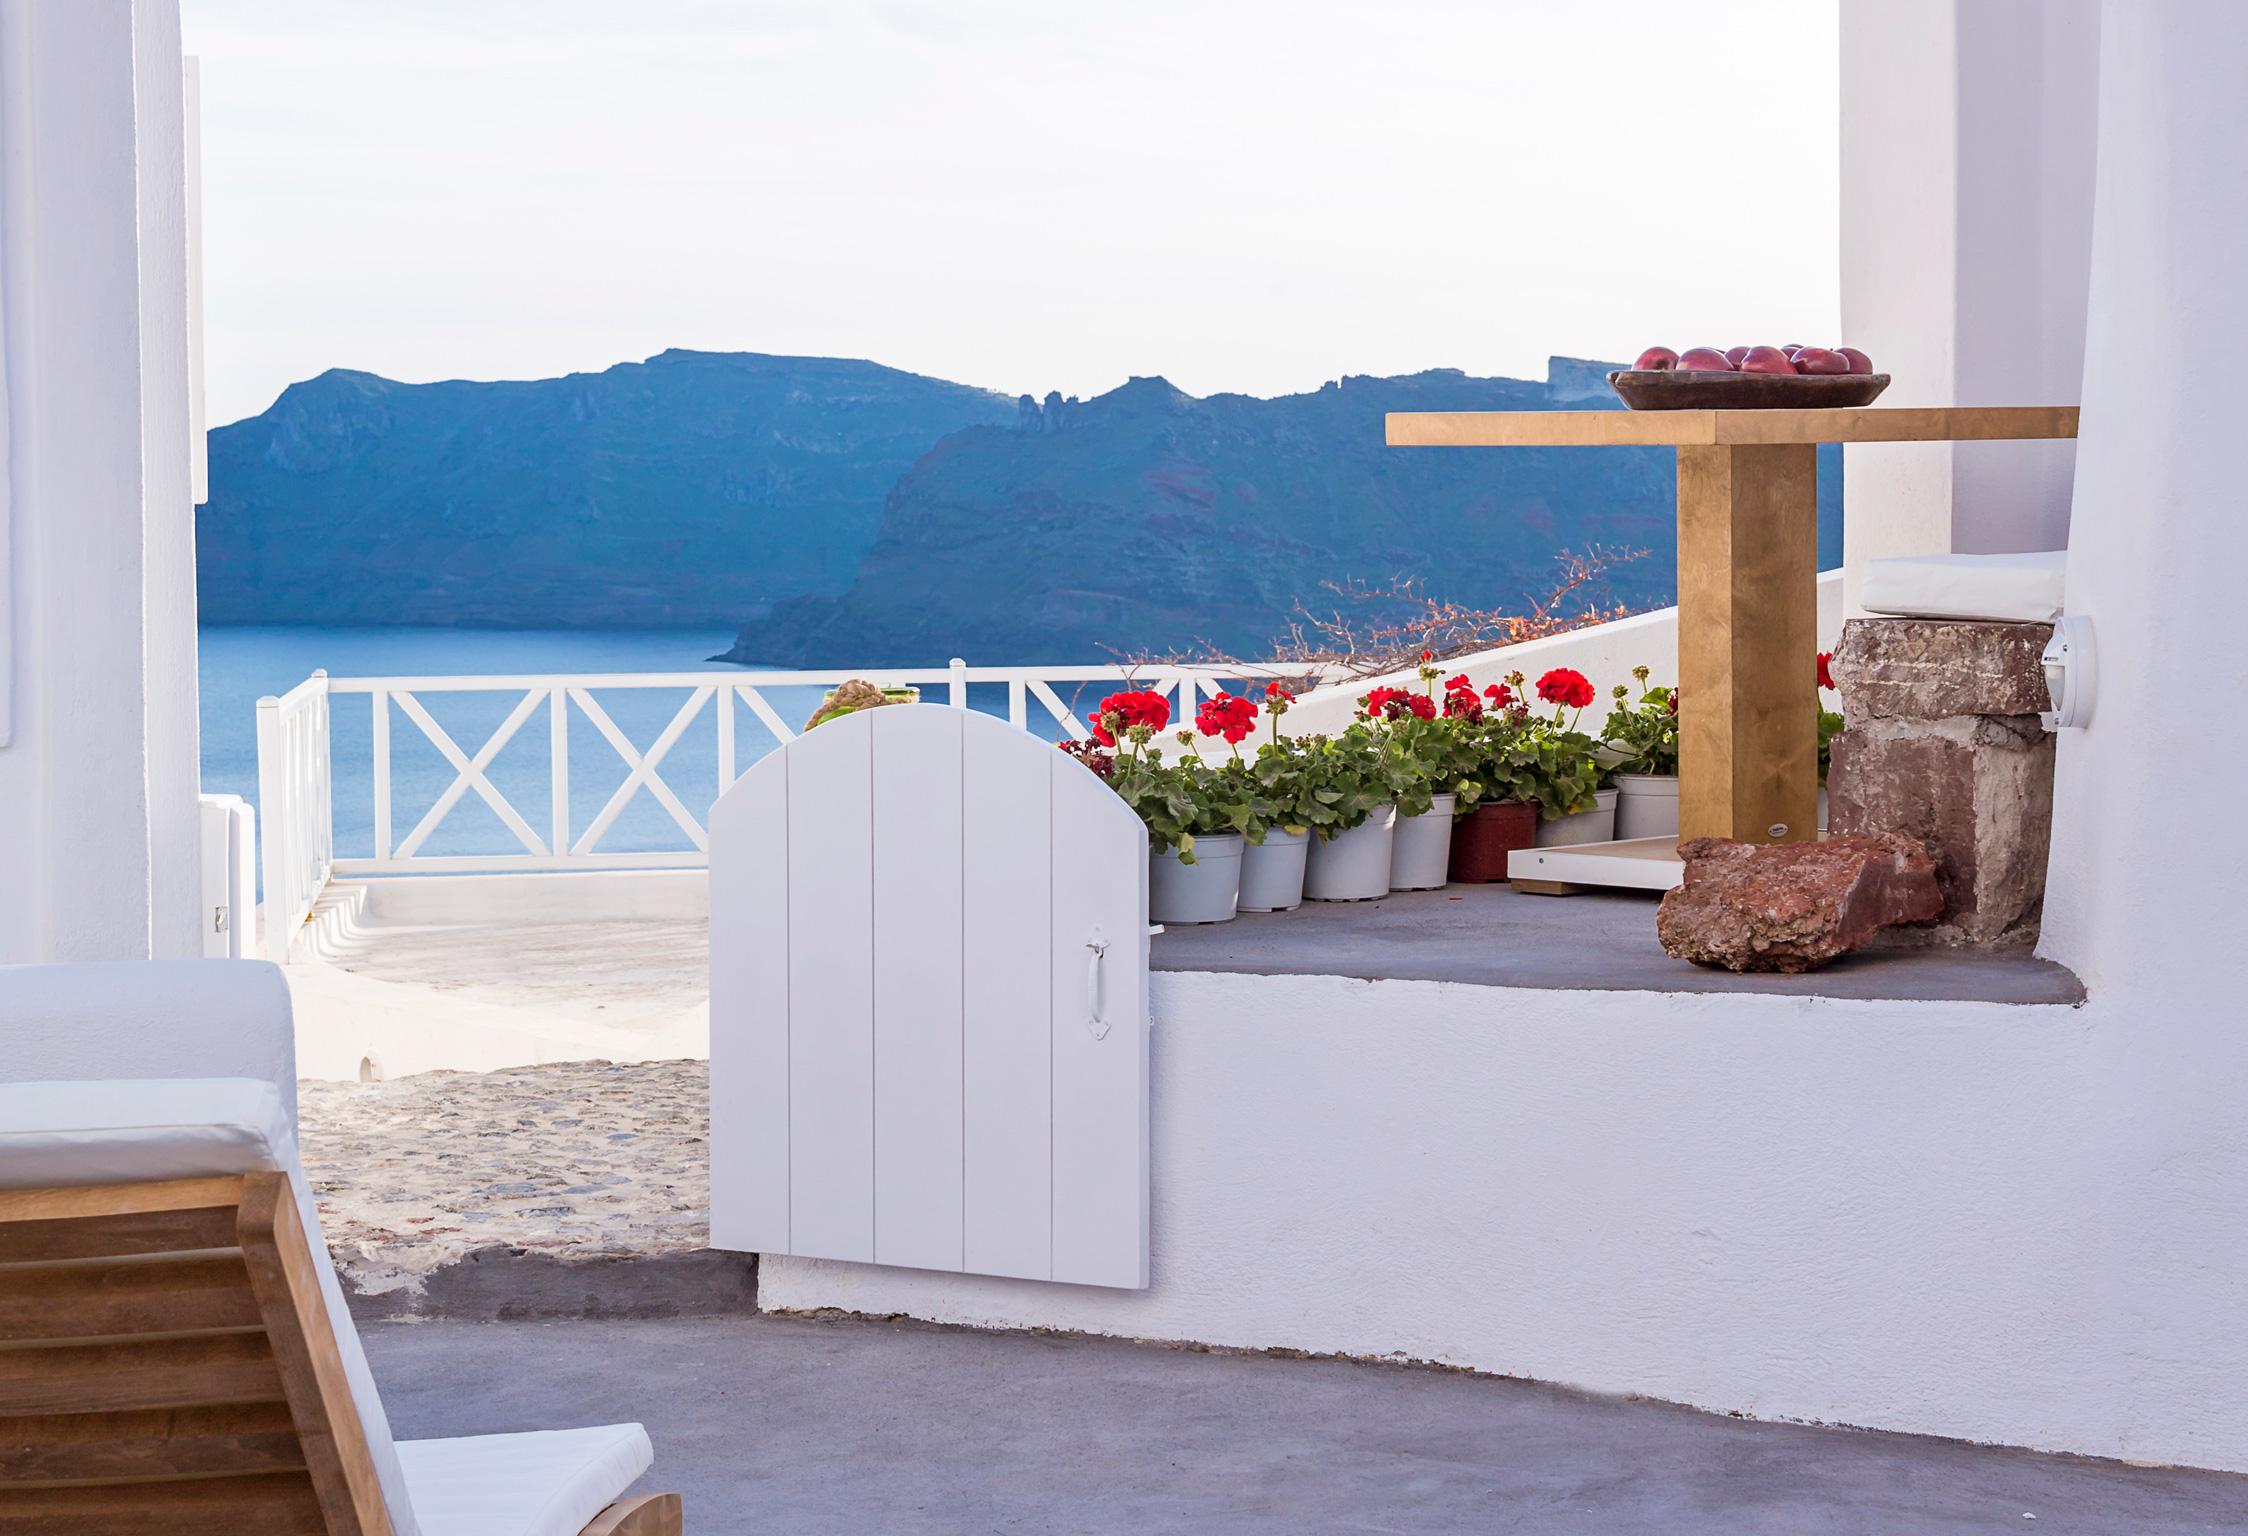 Santorini Villa Thais Aqua jumbotron image